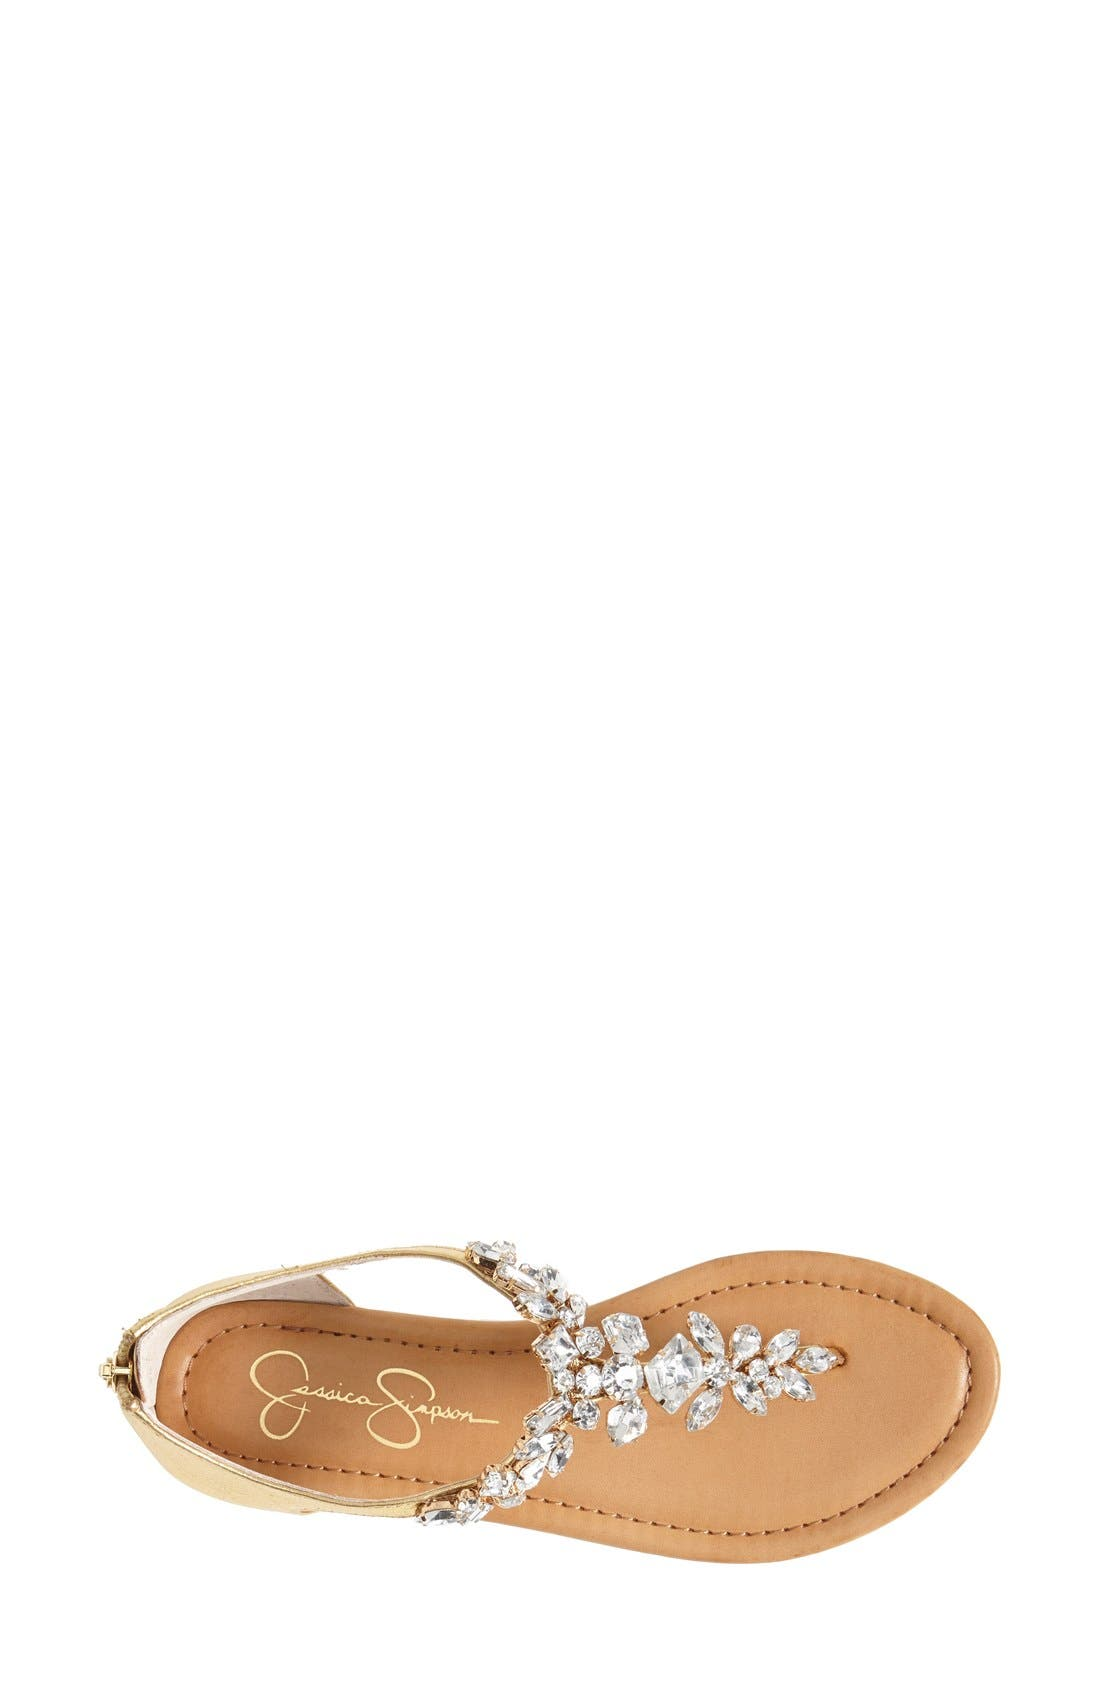 Alternate Image 3  - Jessica Simpson 'Radient' Crystal Embellished Sandal (Women)